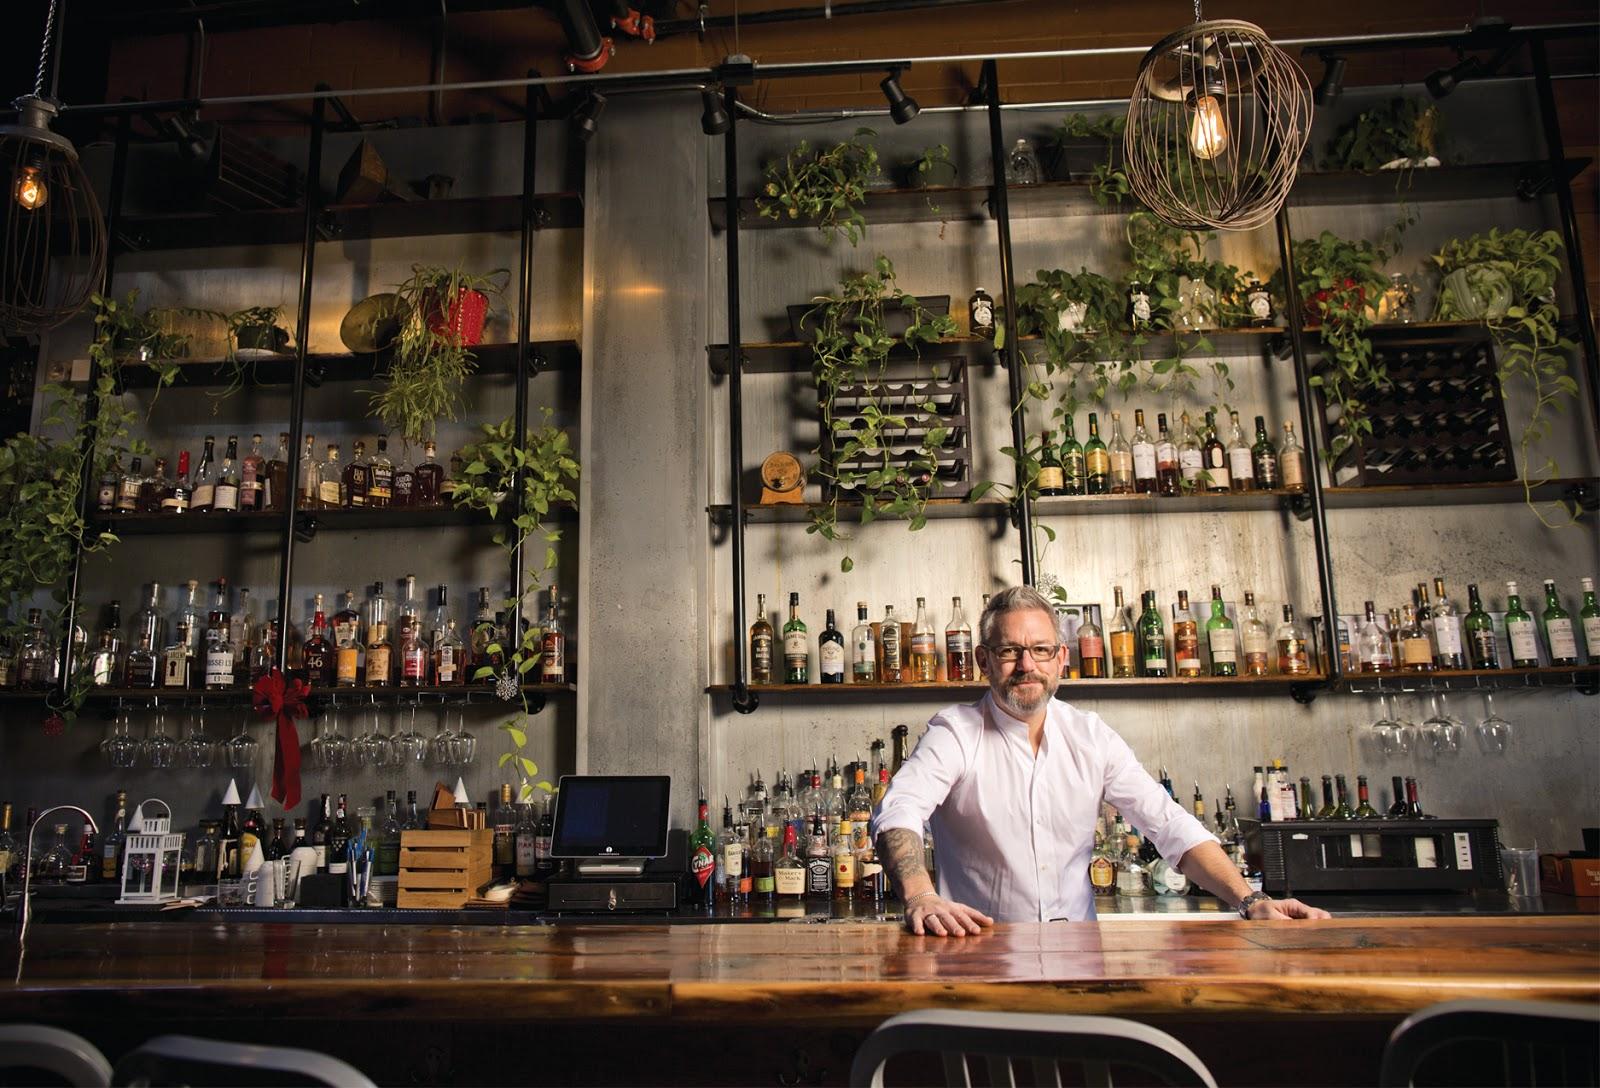 Neighbor Spotlight: The Story of a Midtown Village Wining & Dining ...